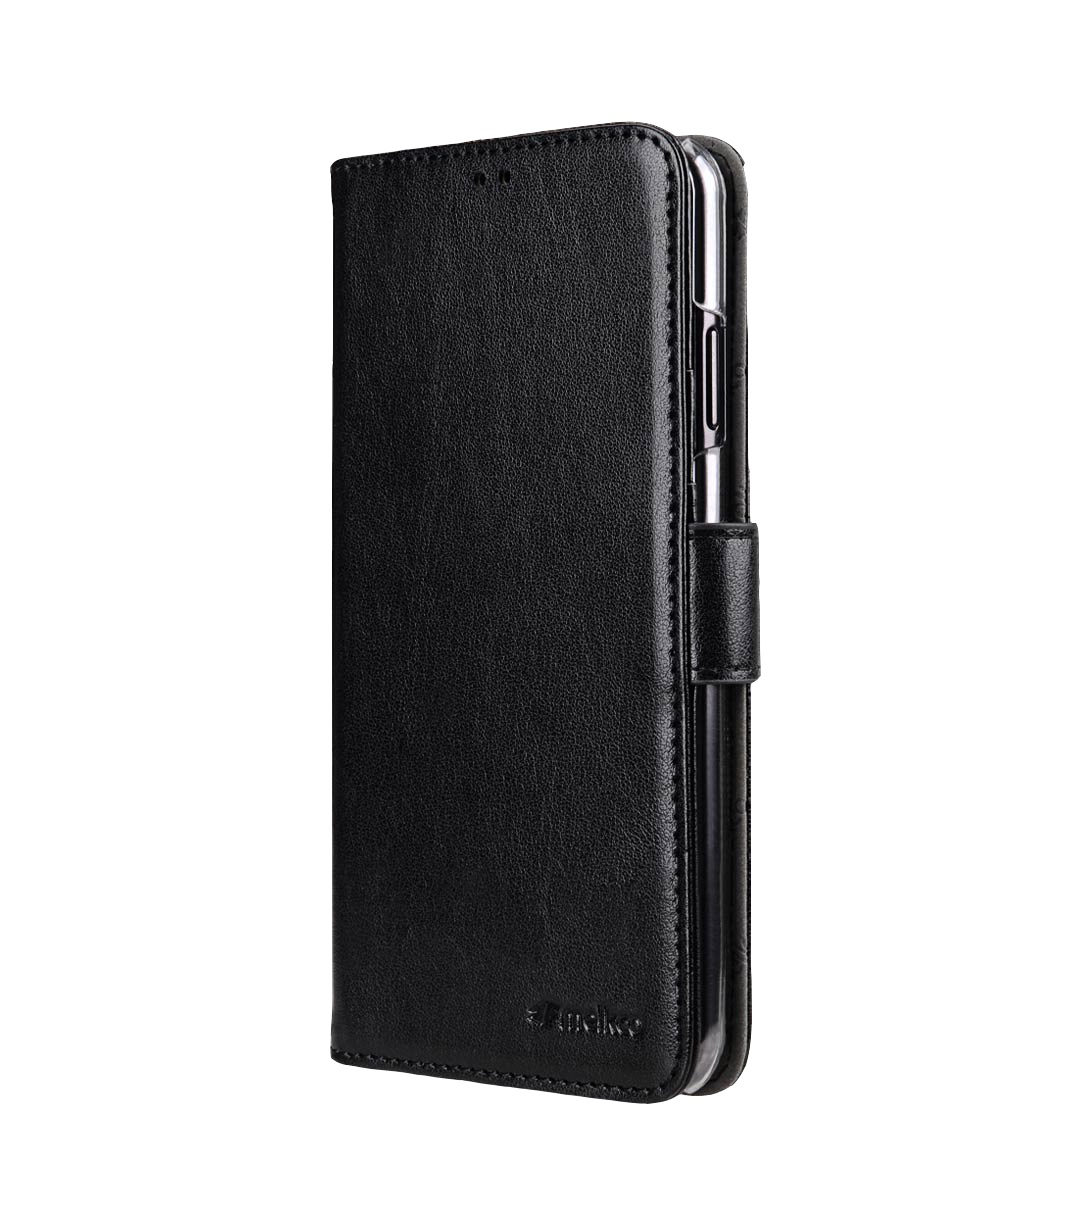 Melkco Walletcase Xiaomi Mi 10/Mi 10 Pro Black